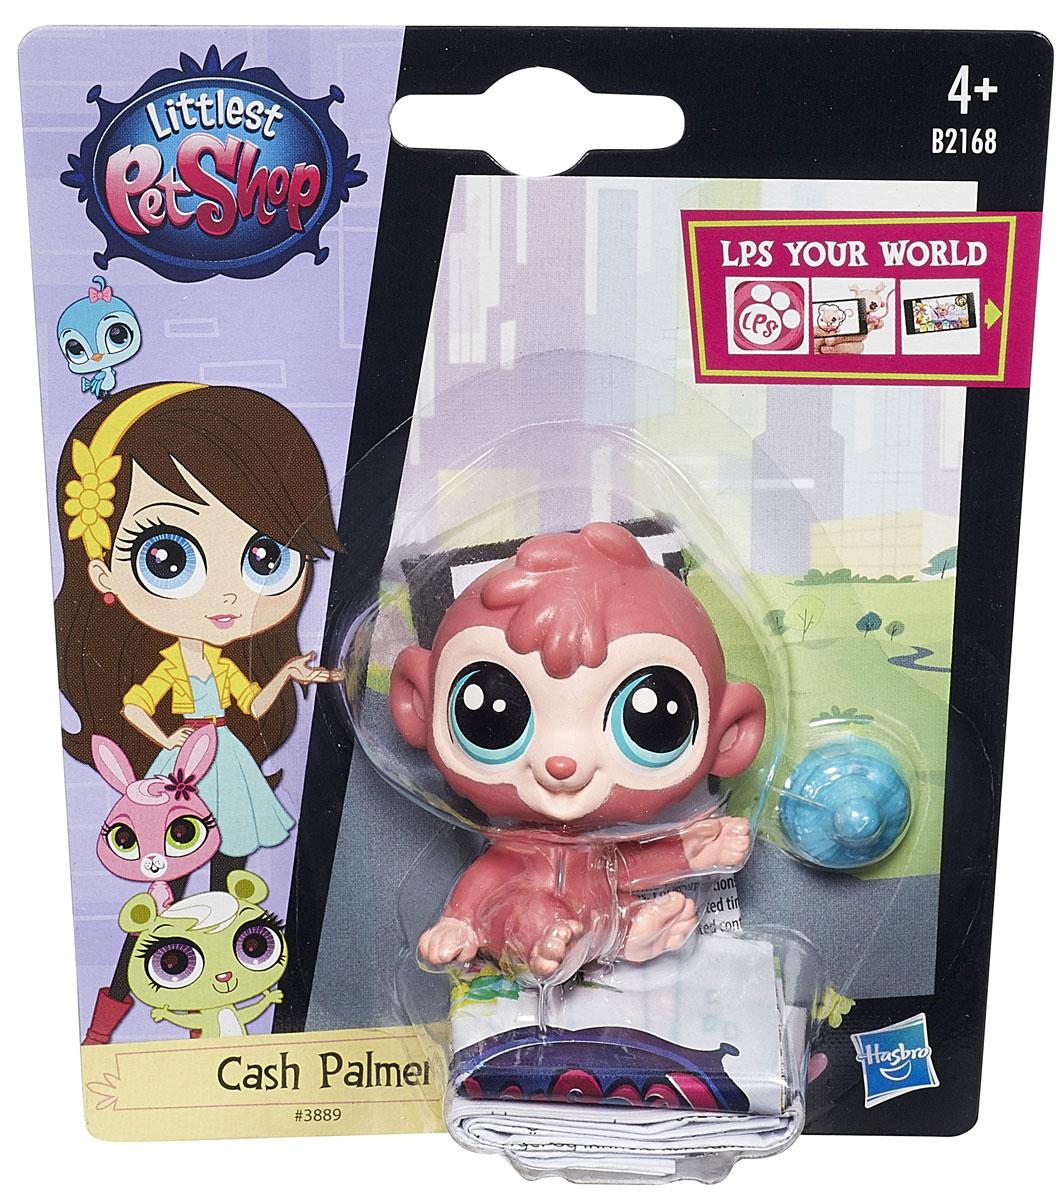 Littlest Pet Shop Фигурка Cash Palmer